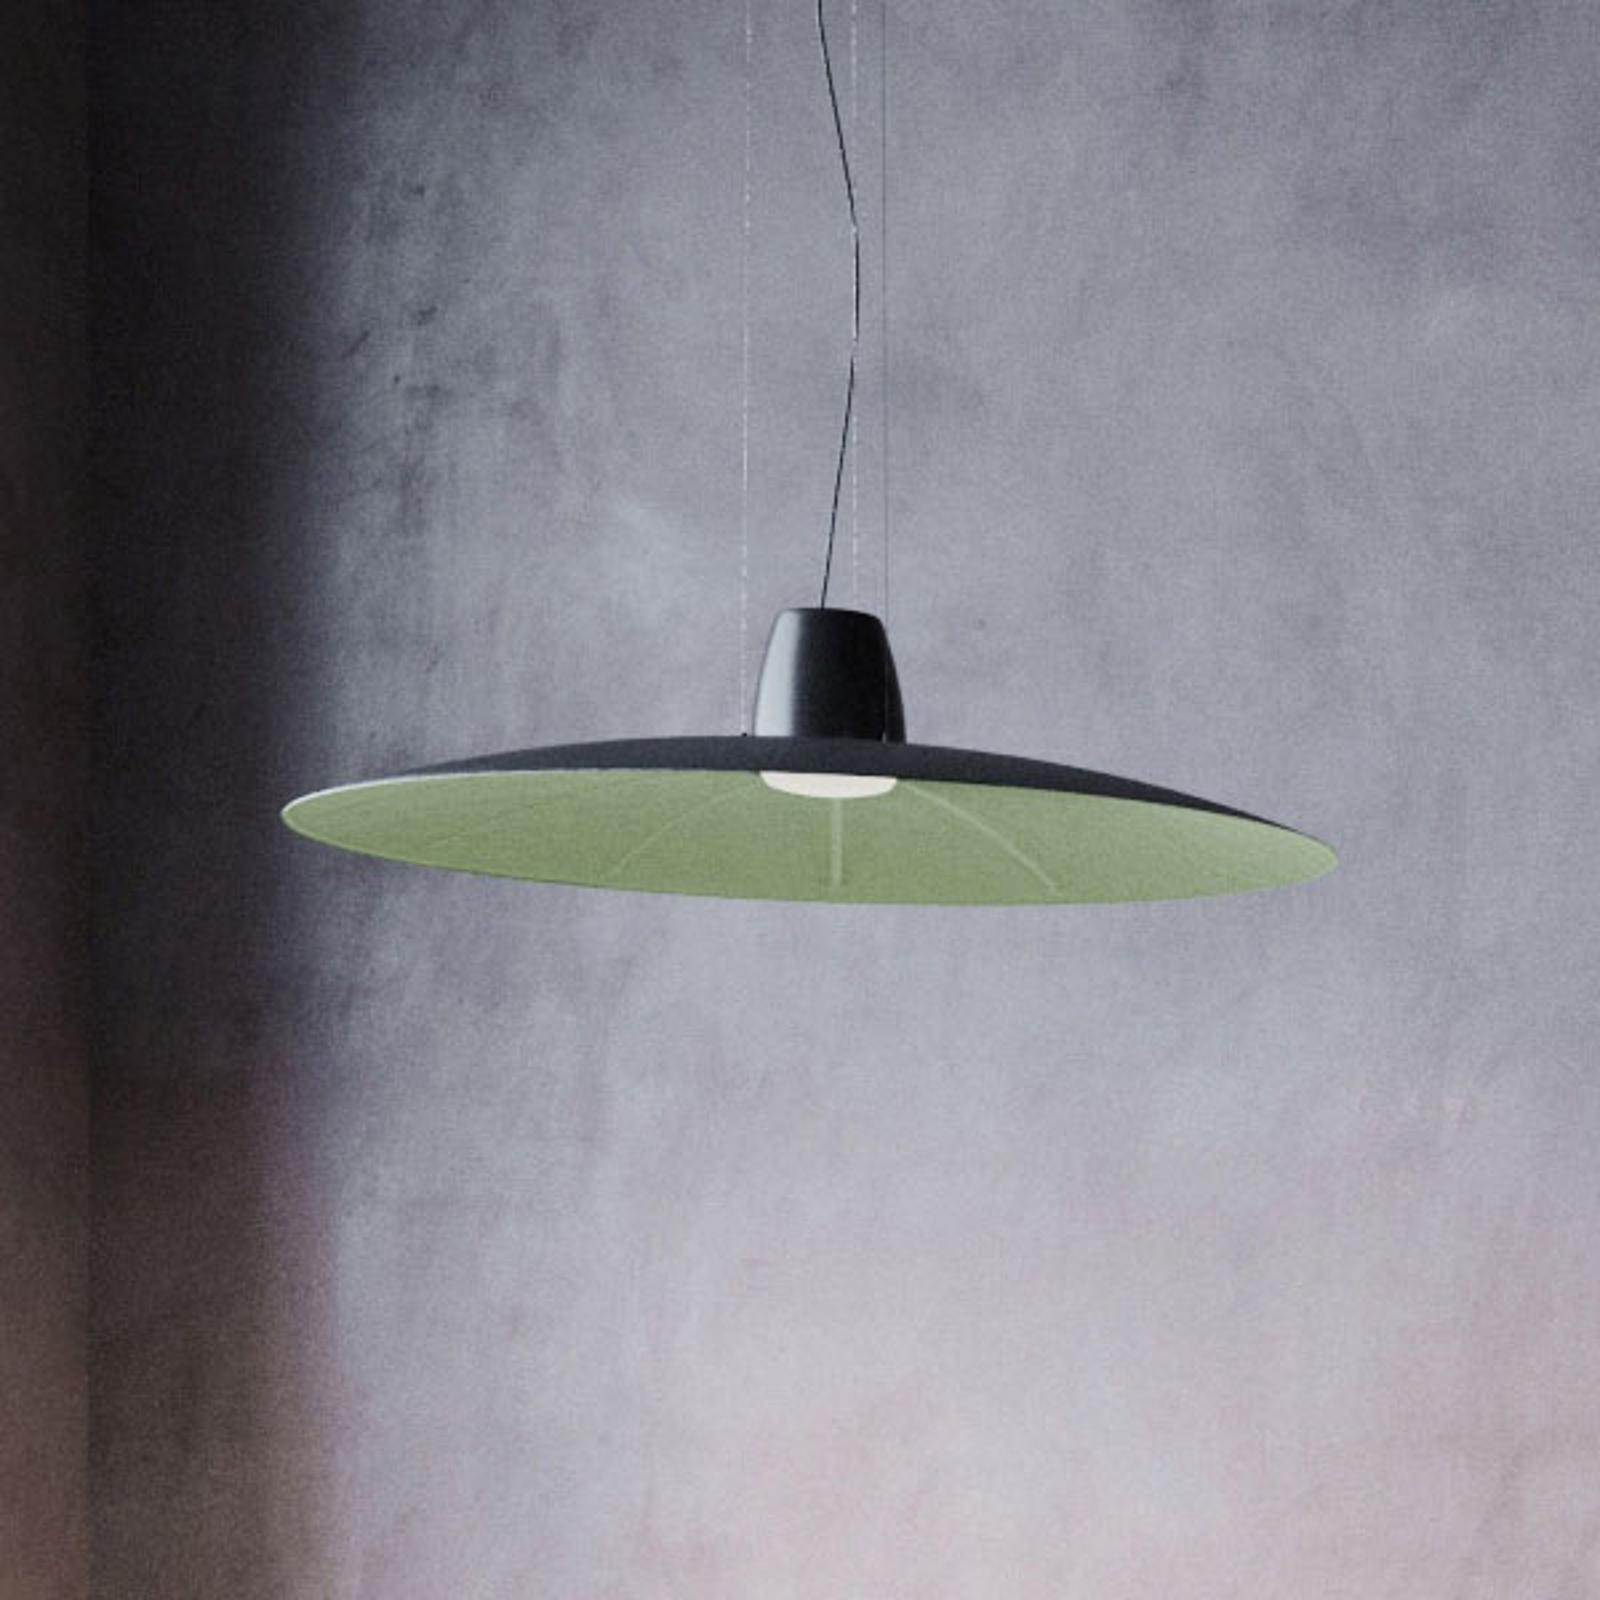 Martinelli Luce Lent LED-Hängeleuchte, grün